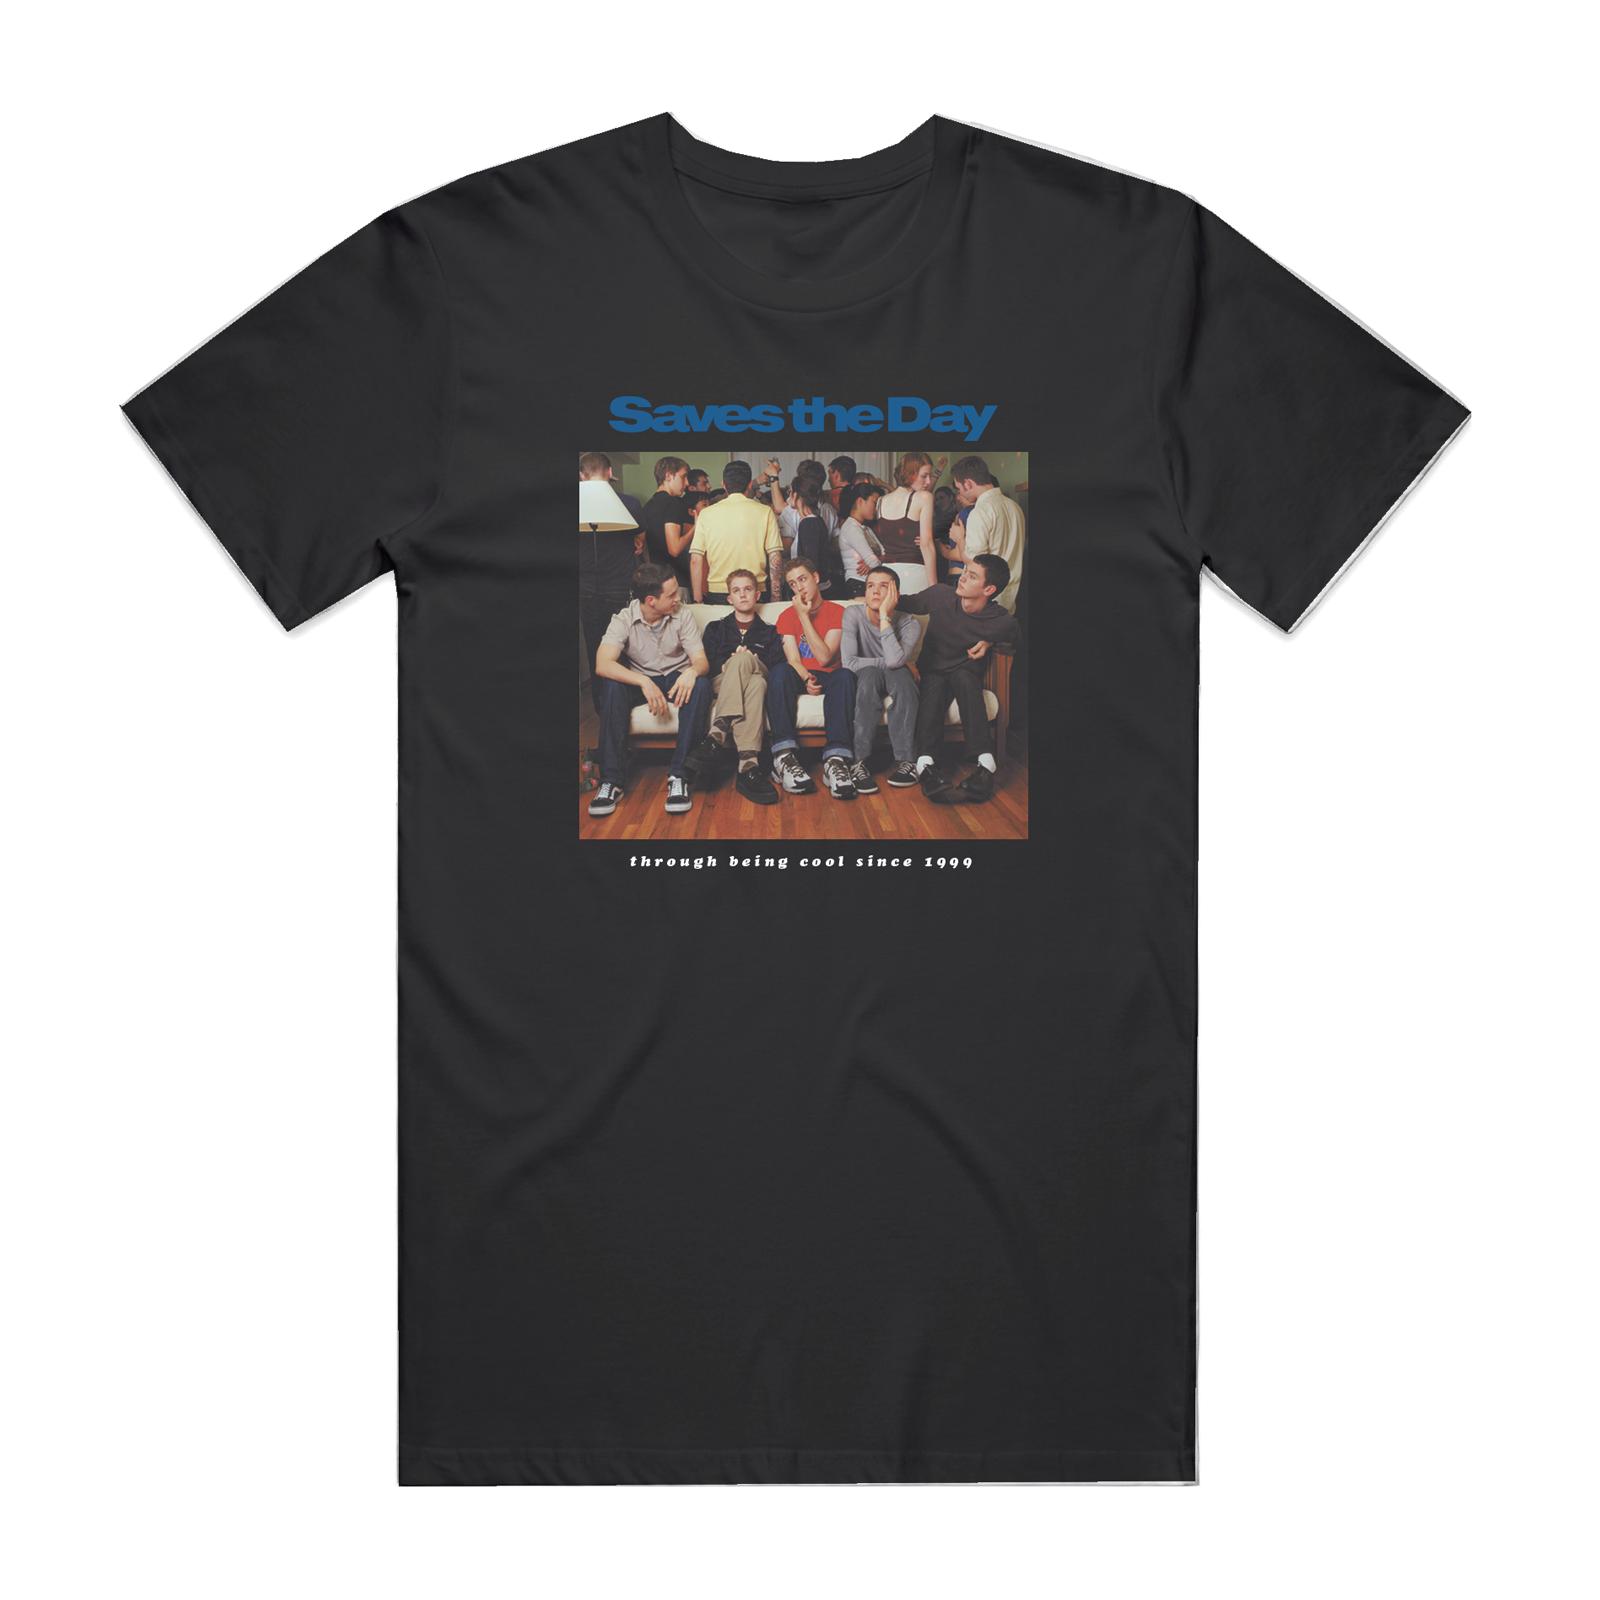 Through Being Cool - Black T-Shirt